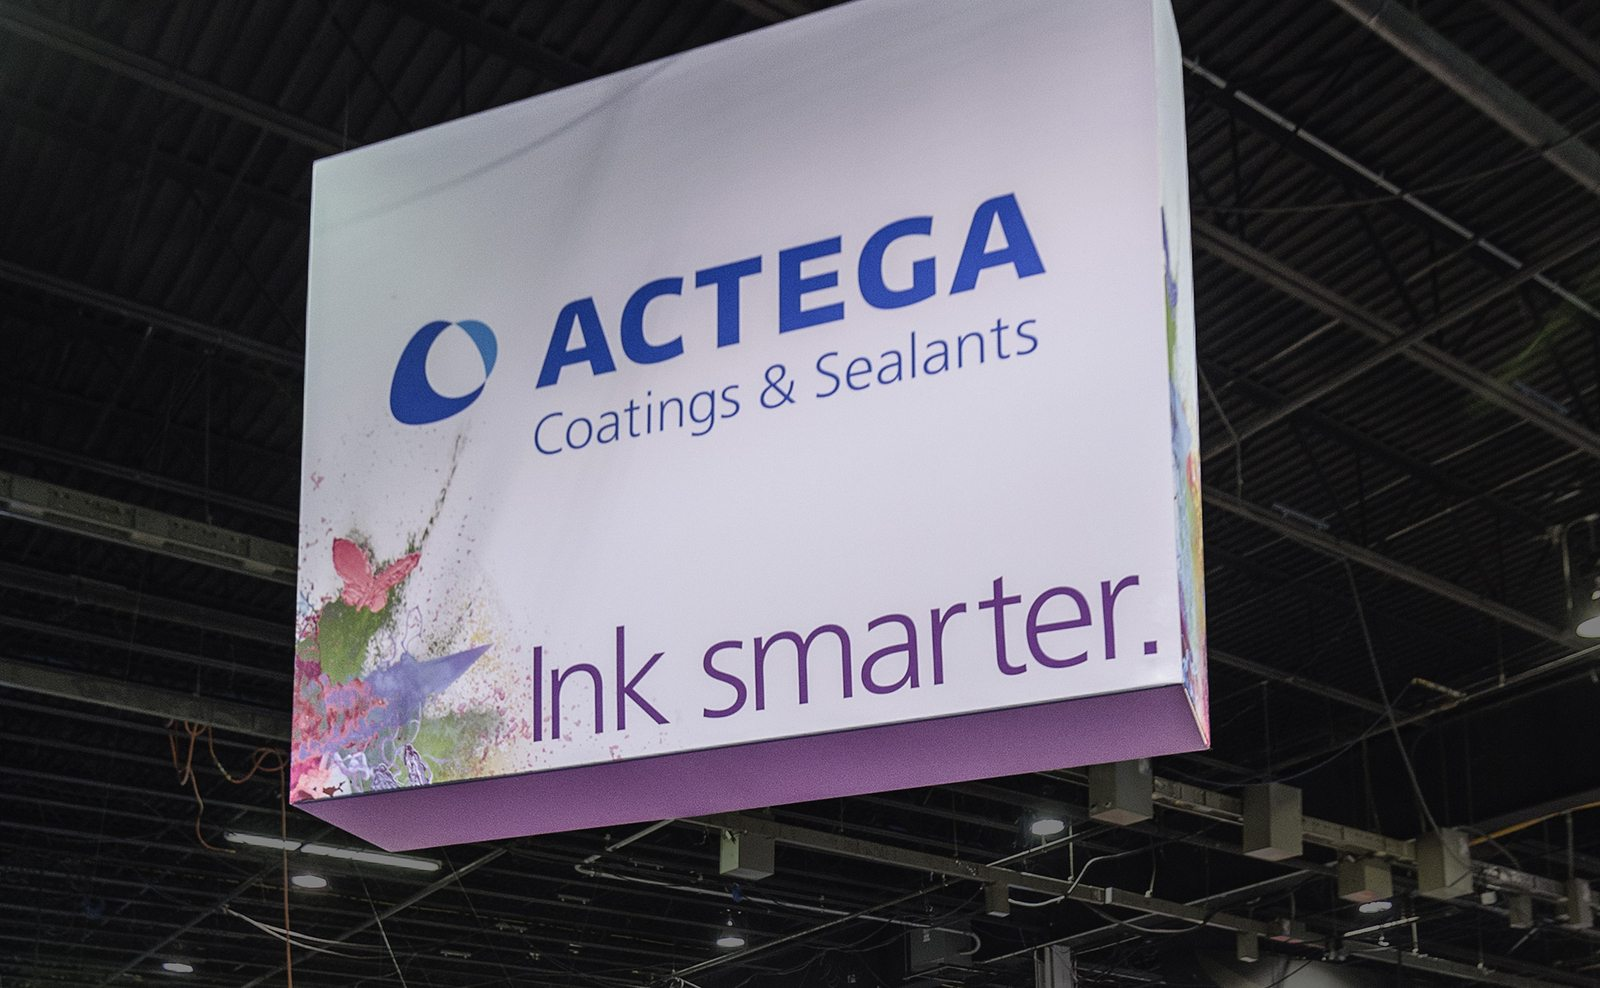 Actega_hanging_sign